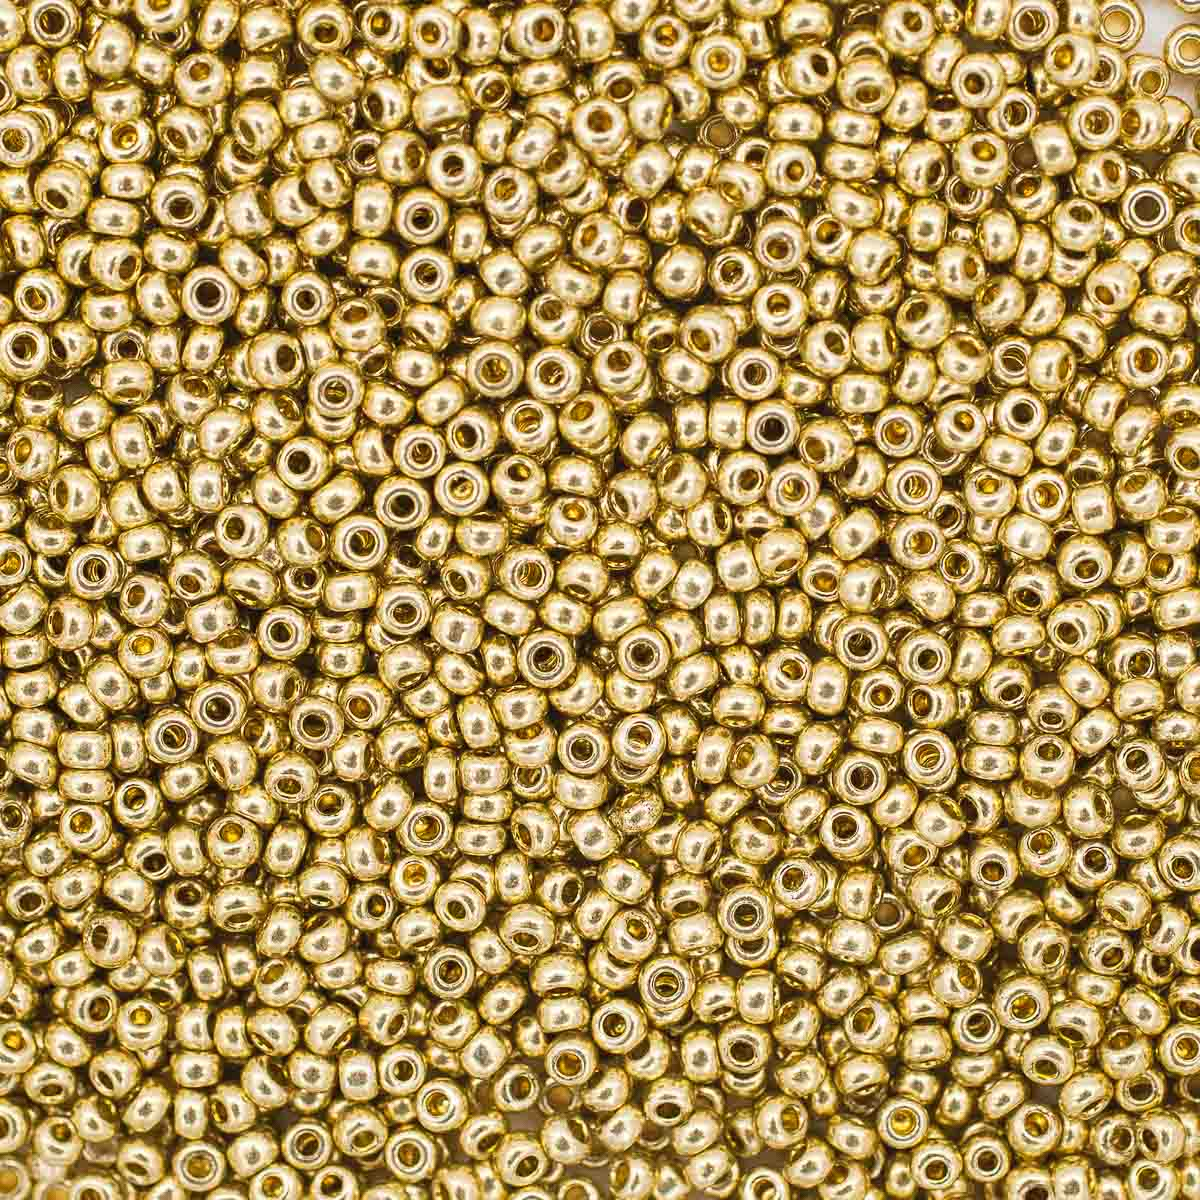 331-19001-10/0-18151 Бисер прозрачный solgel 10/0, круг.отв., 20гр Preciosa